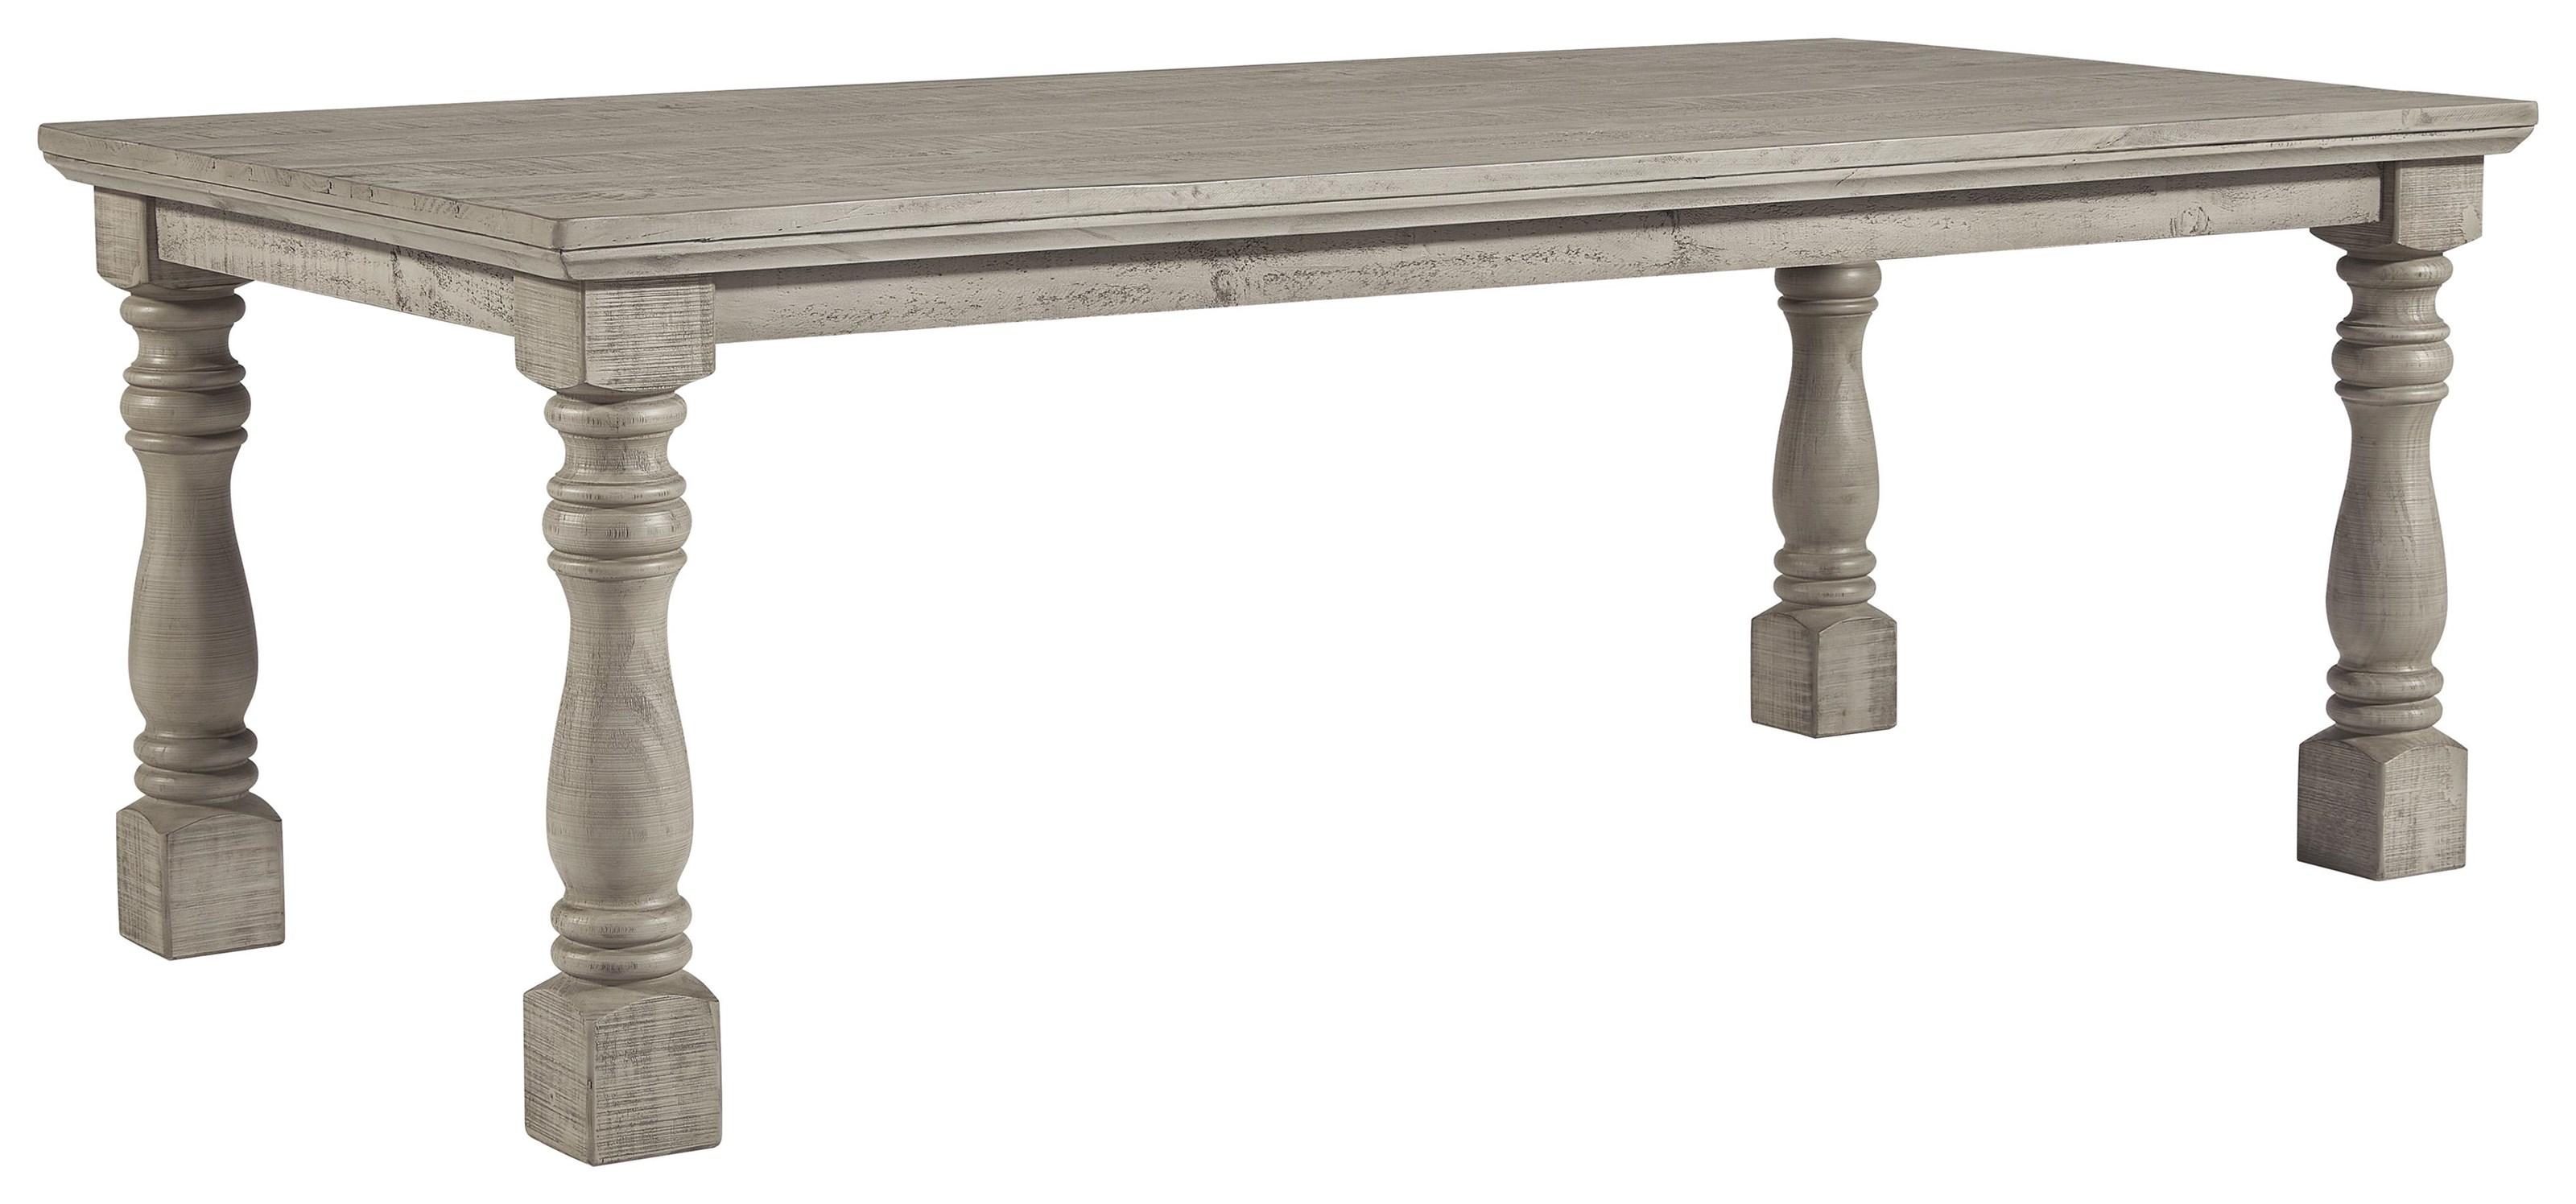 Harrastone Rectangular Dining Table by Millennium at Sam Levitz Outlet